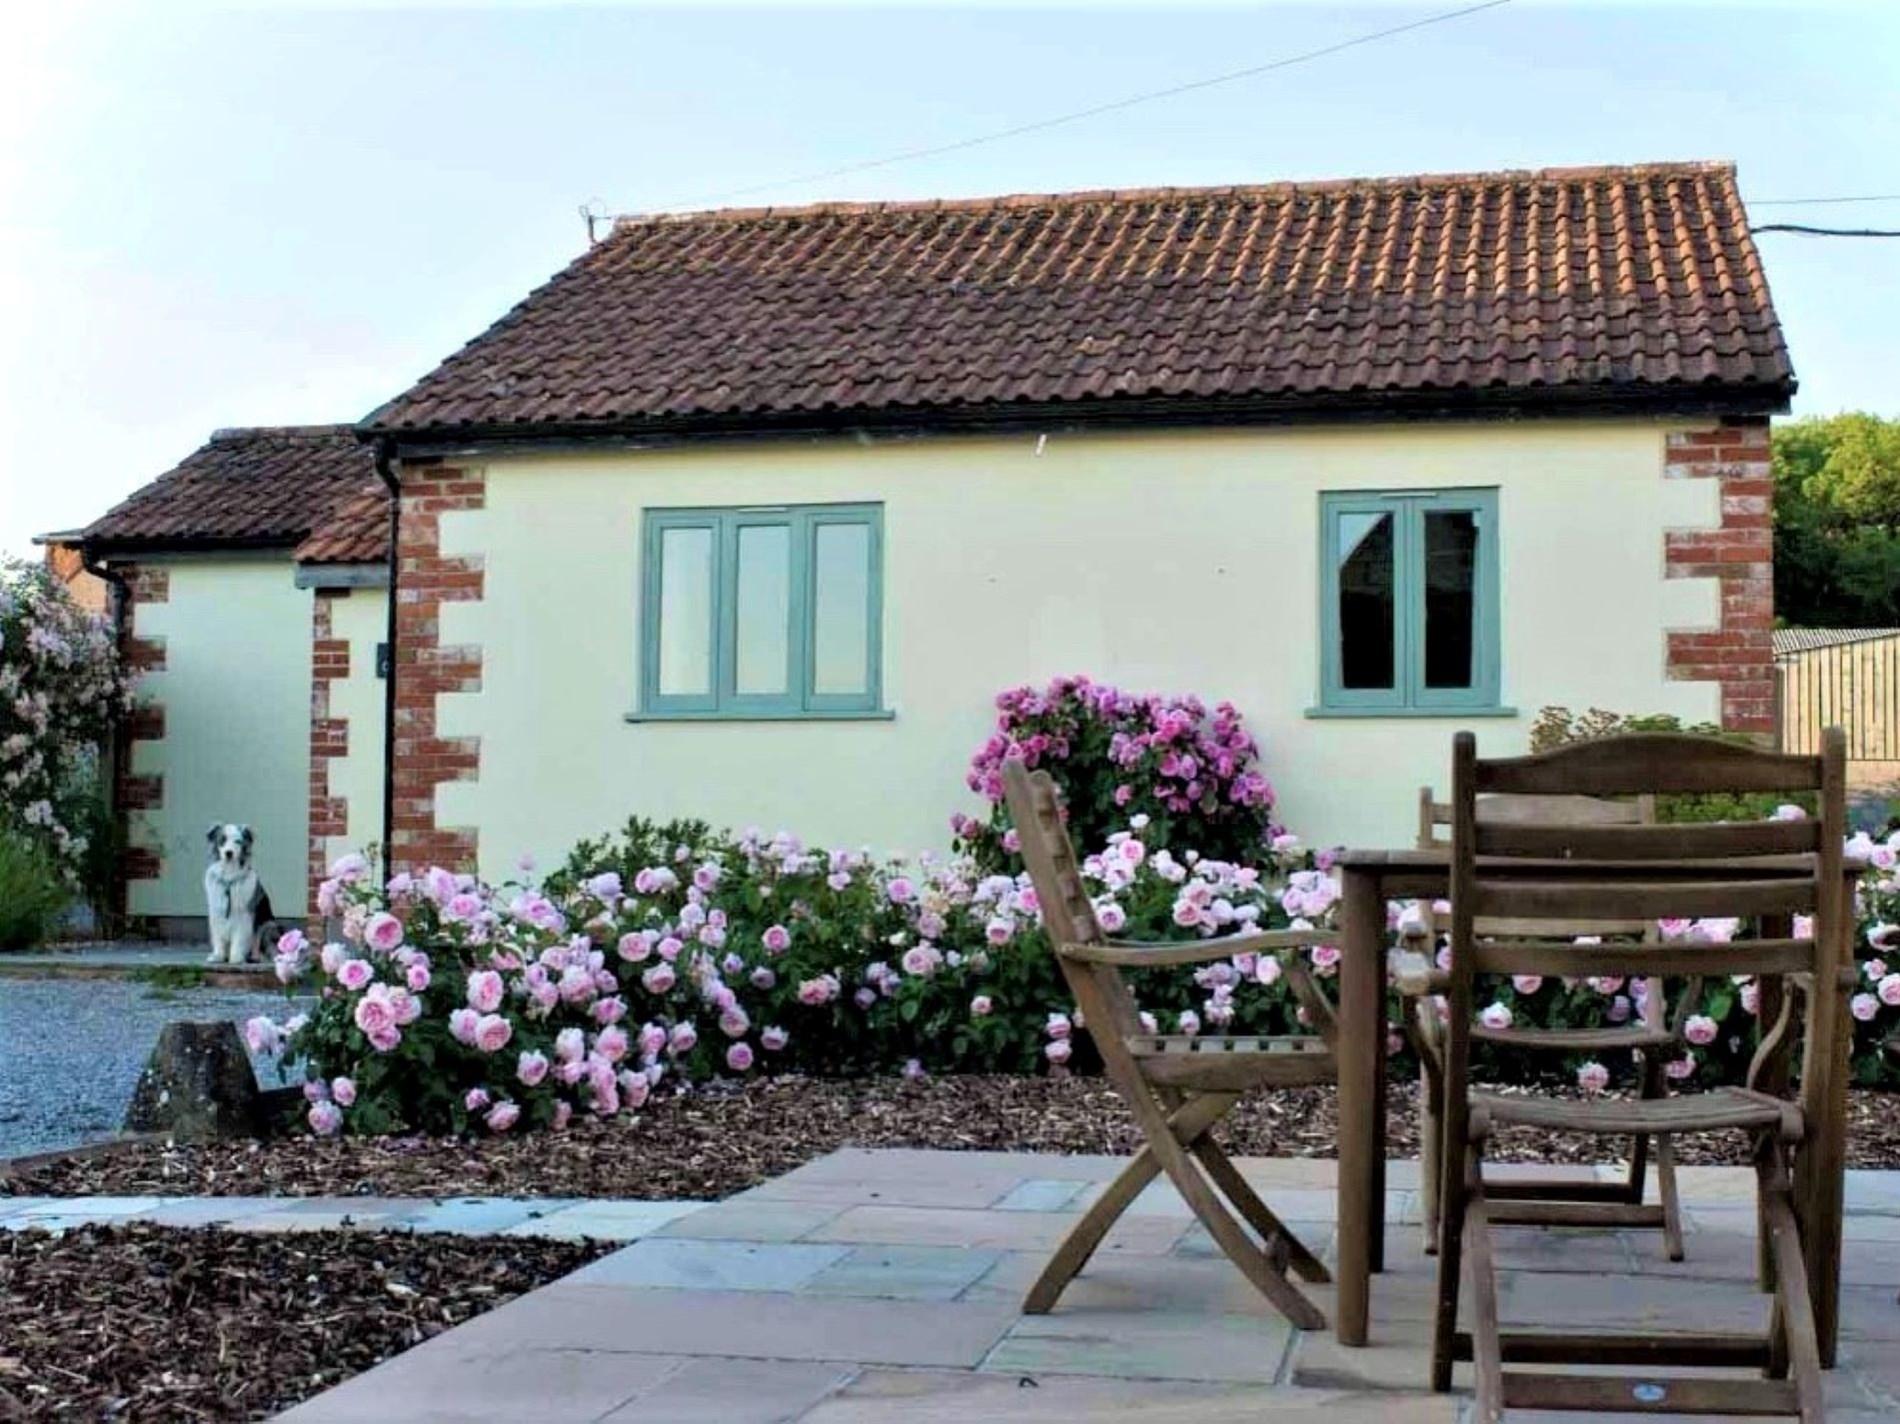 2 Bedroom Cottage in Warminster, Dorset and Somerset